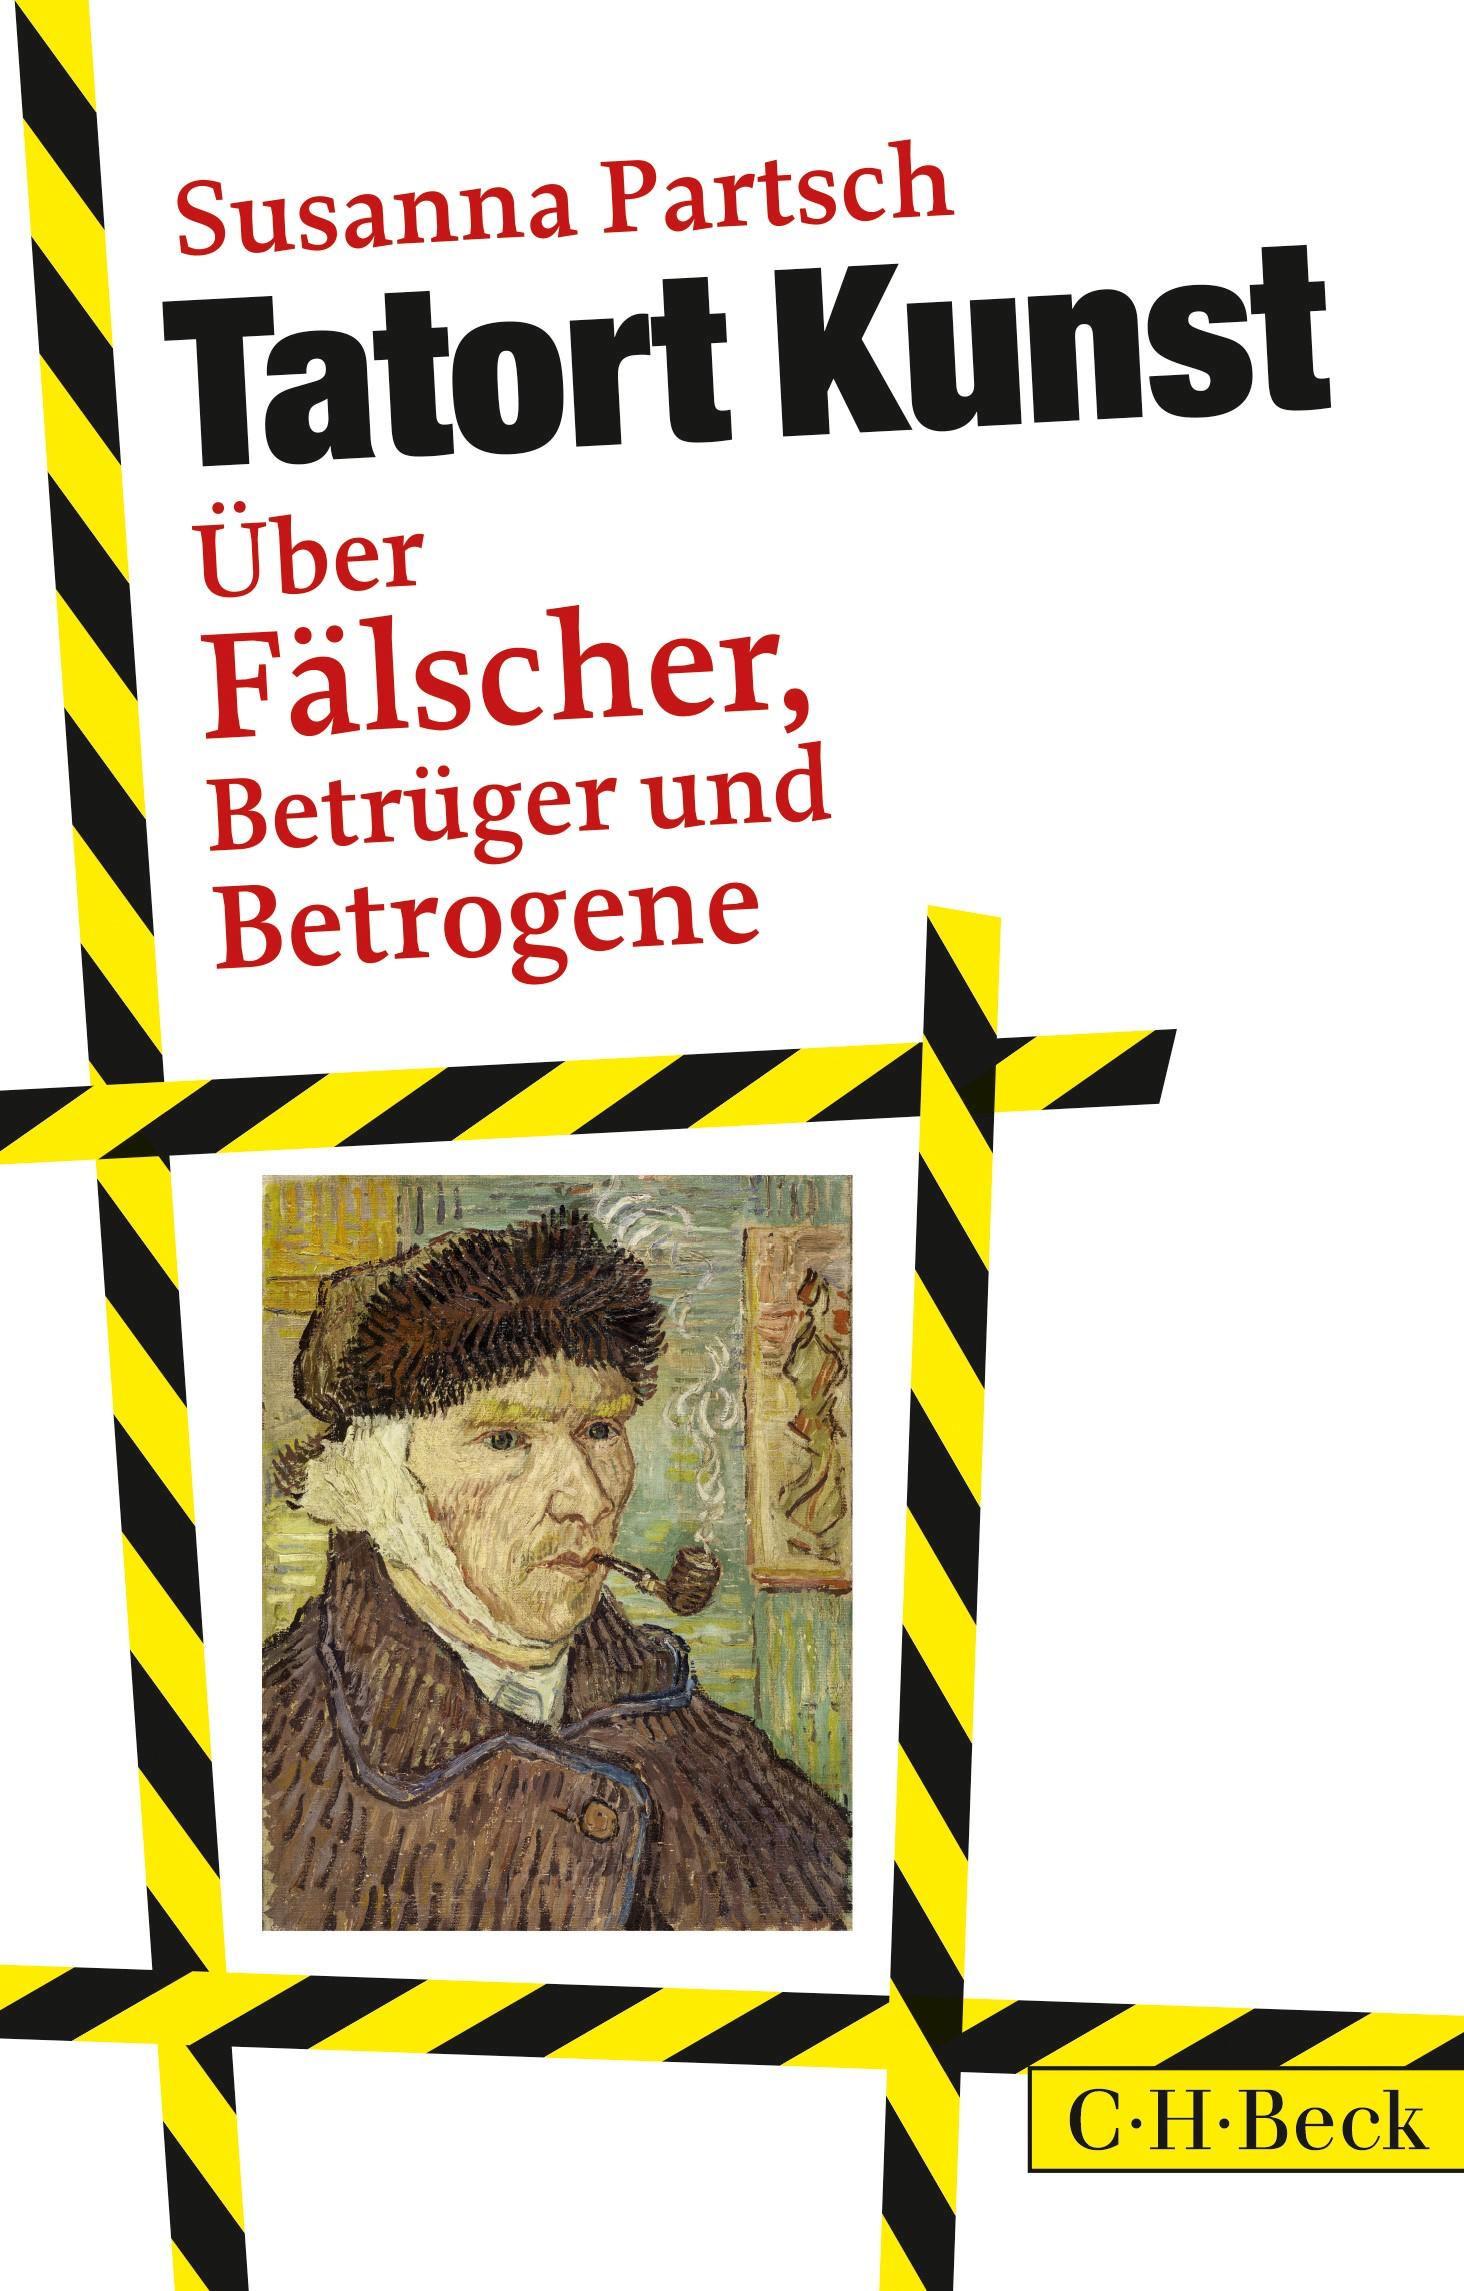 Cover des Buches 'Tatort Kunst'